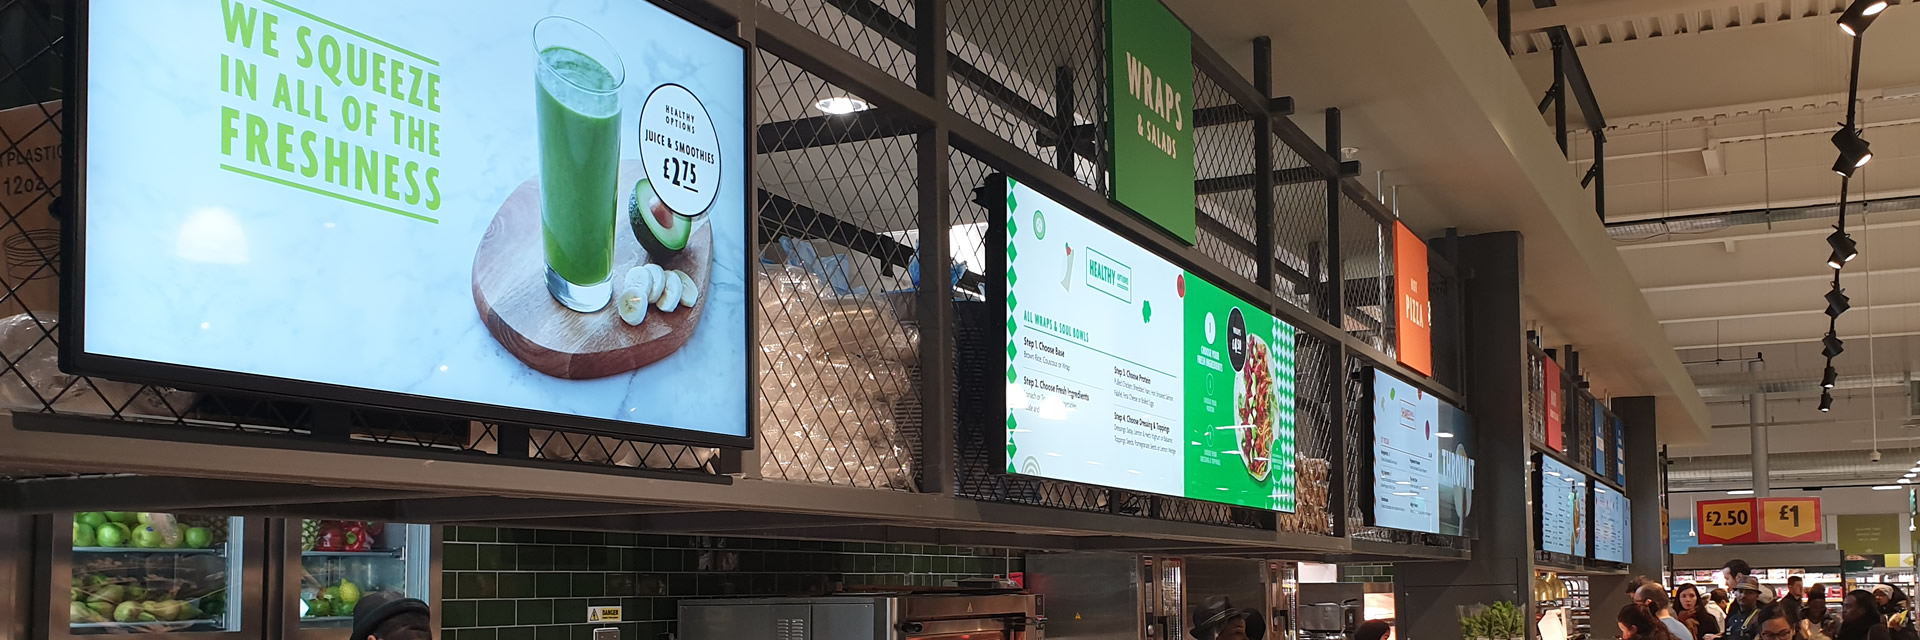 Morrisons London Digital Menu Board Signage